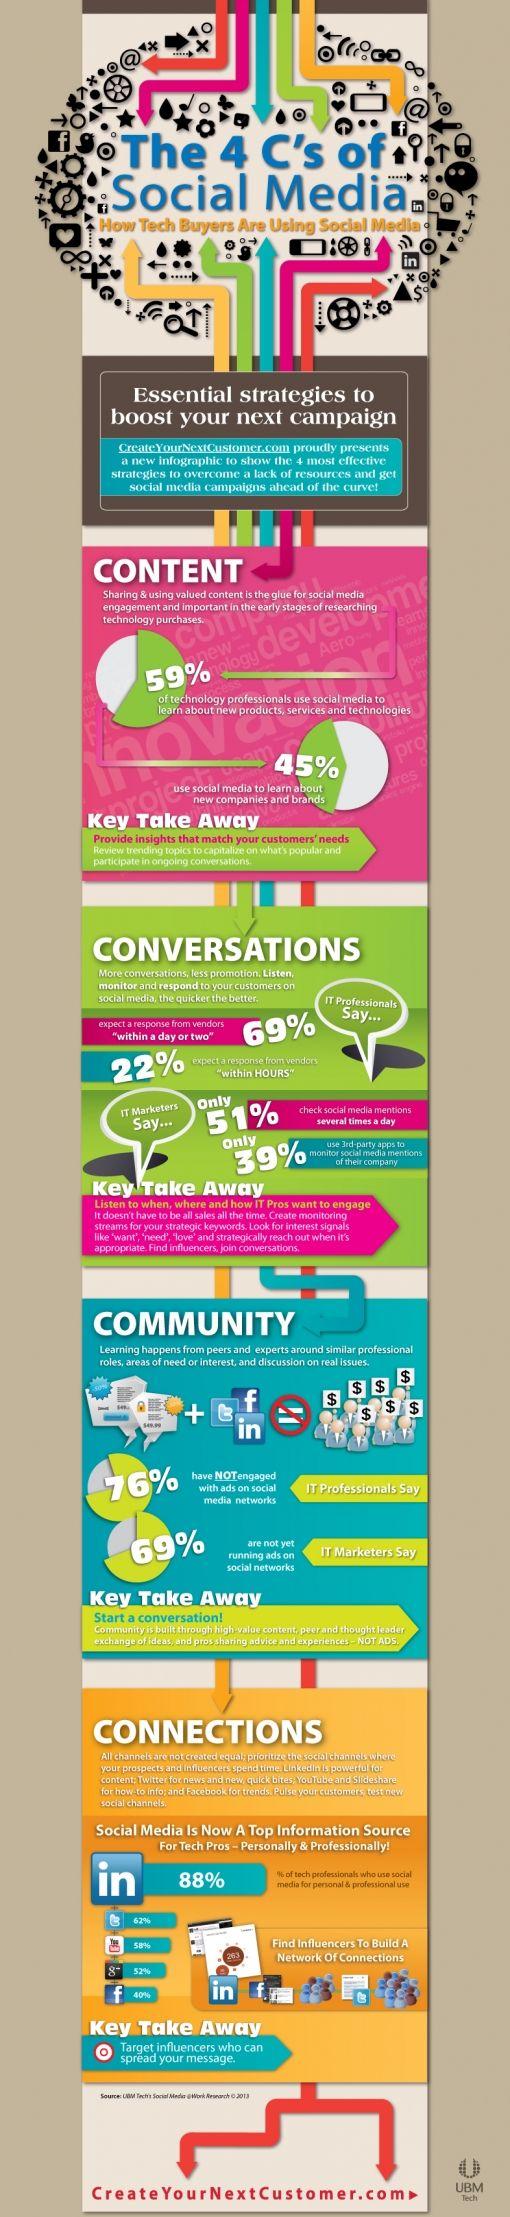 social-media-four-Cs